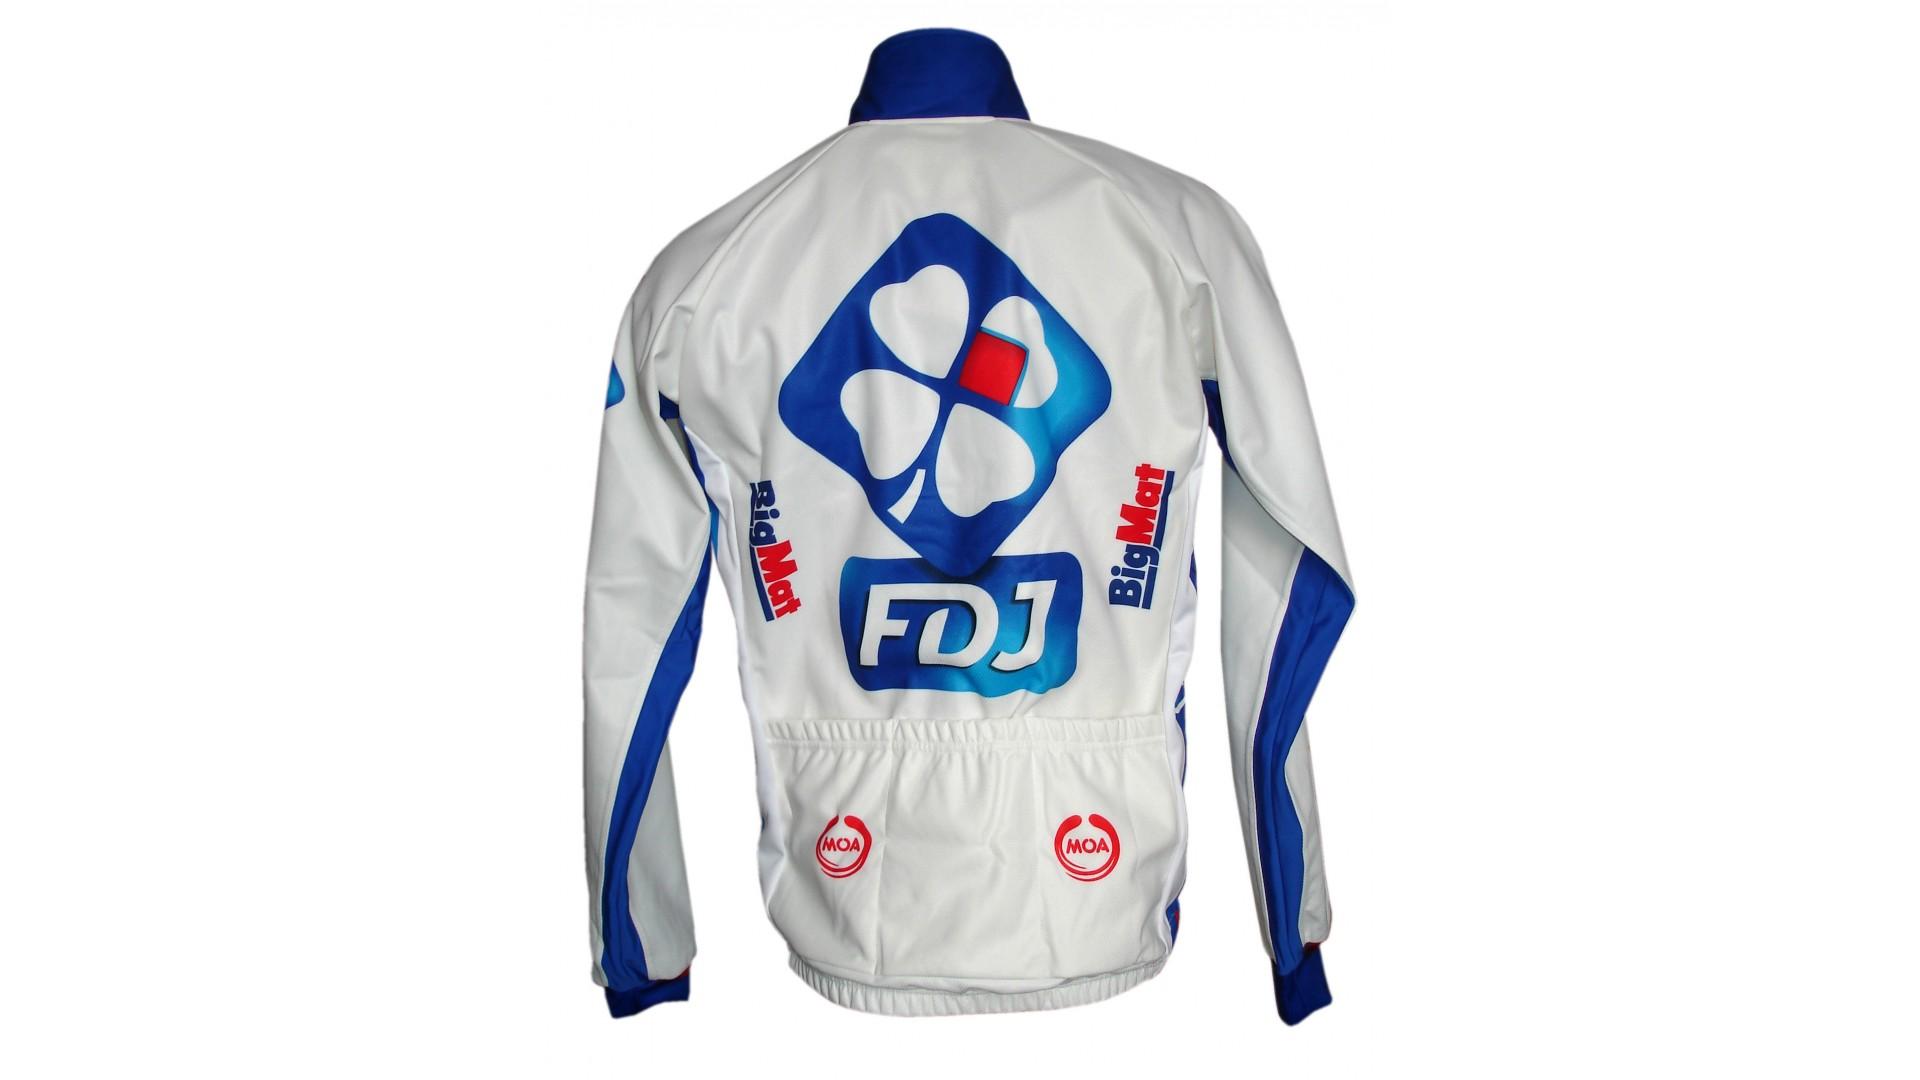 Велокуртка Nalini FDJ-Big Mat зимняя вид сзади